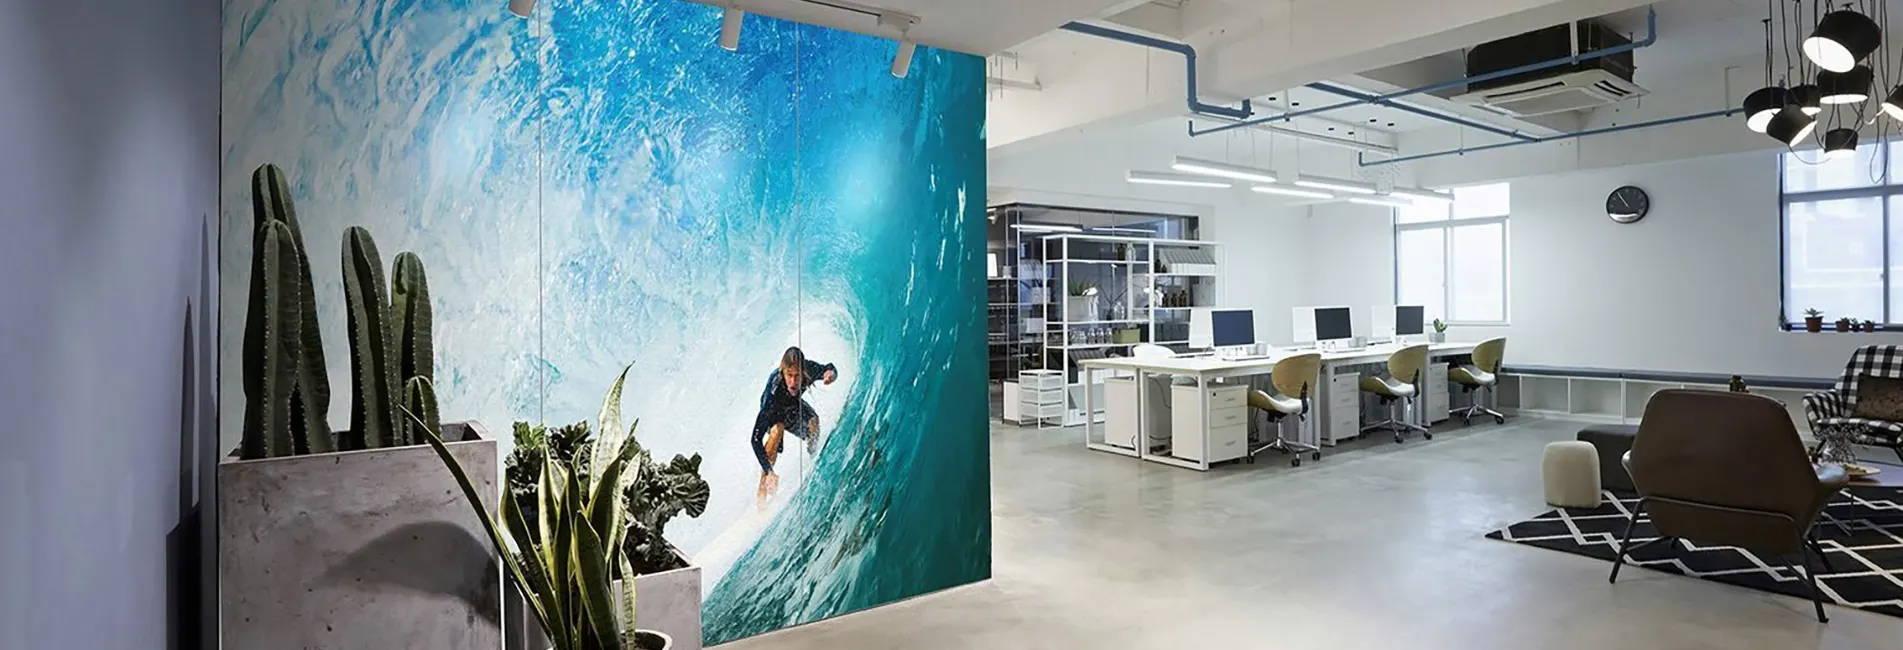 Bespoke Printed Acoustic Wall Coverings